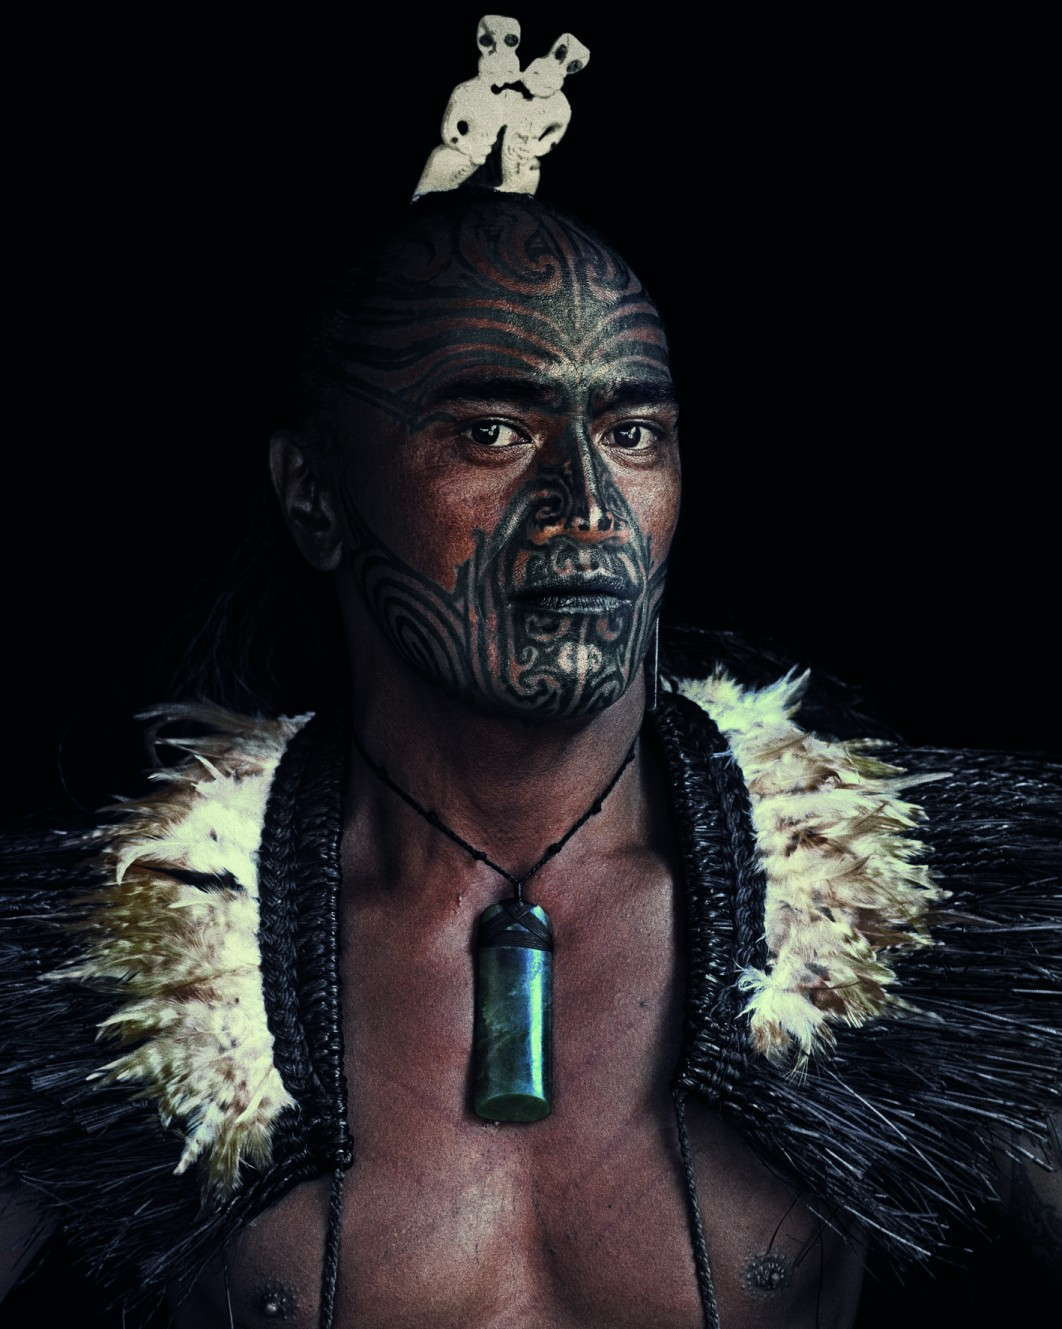 Stunning Photographs Of The World's Last Indigenous Tribes - TA MOKO